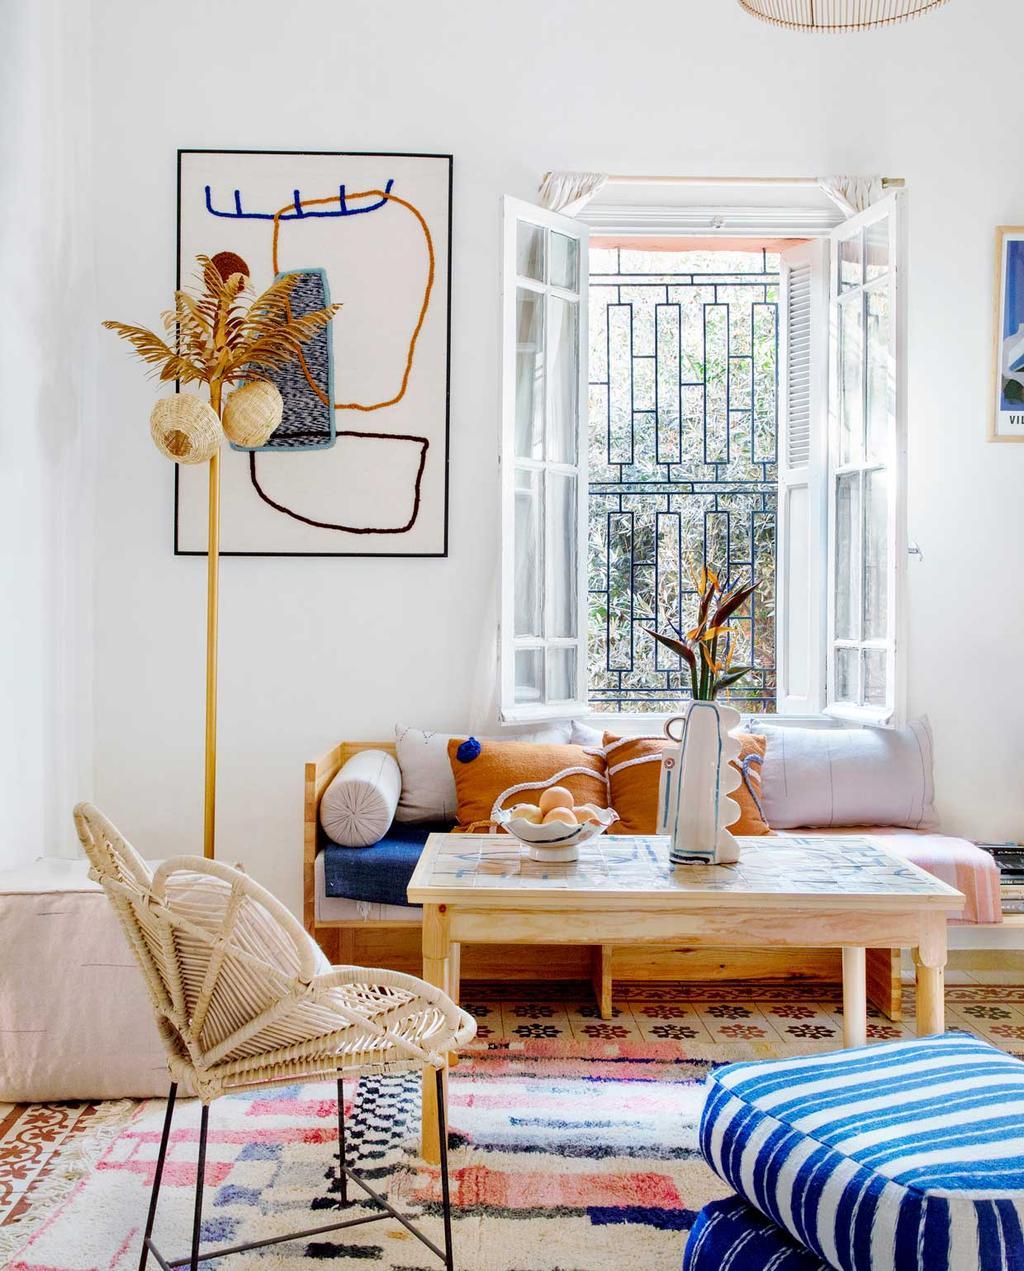 vtwonen 2020-09 | Binnenkijken marrakech | lichte woonkamer met Marokkaanse sfeer